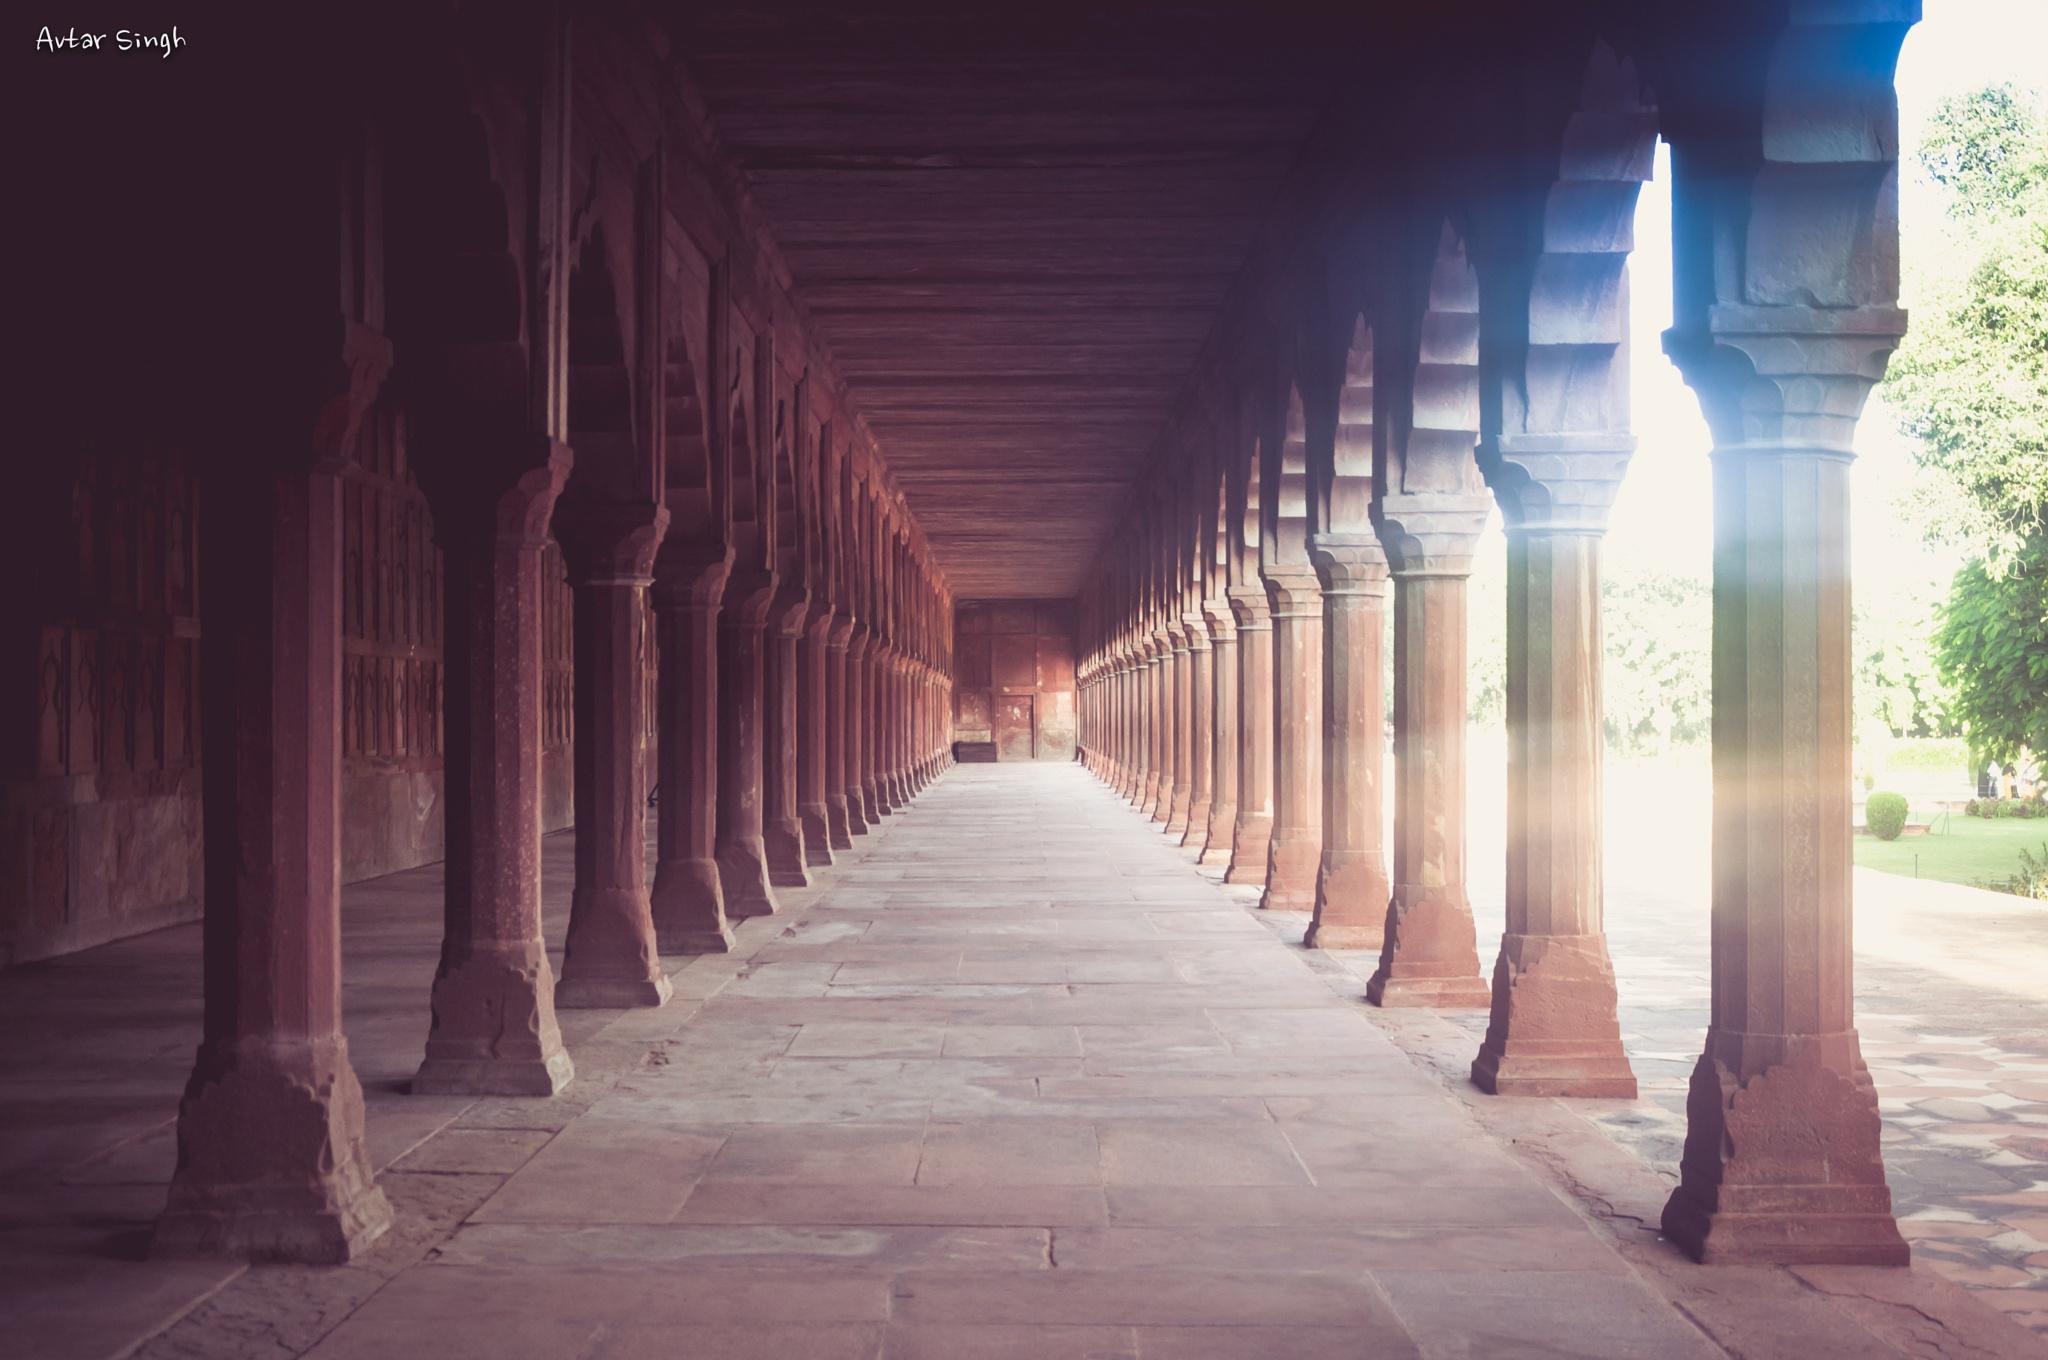 Corridor  by Avtar Singh